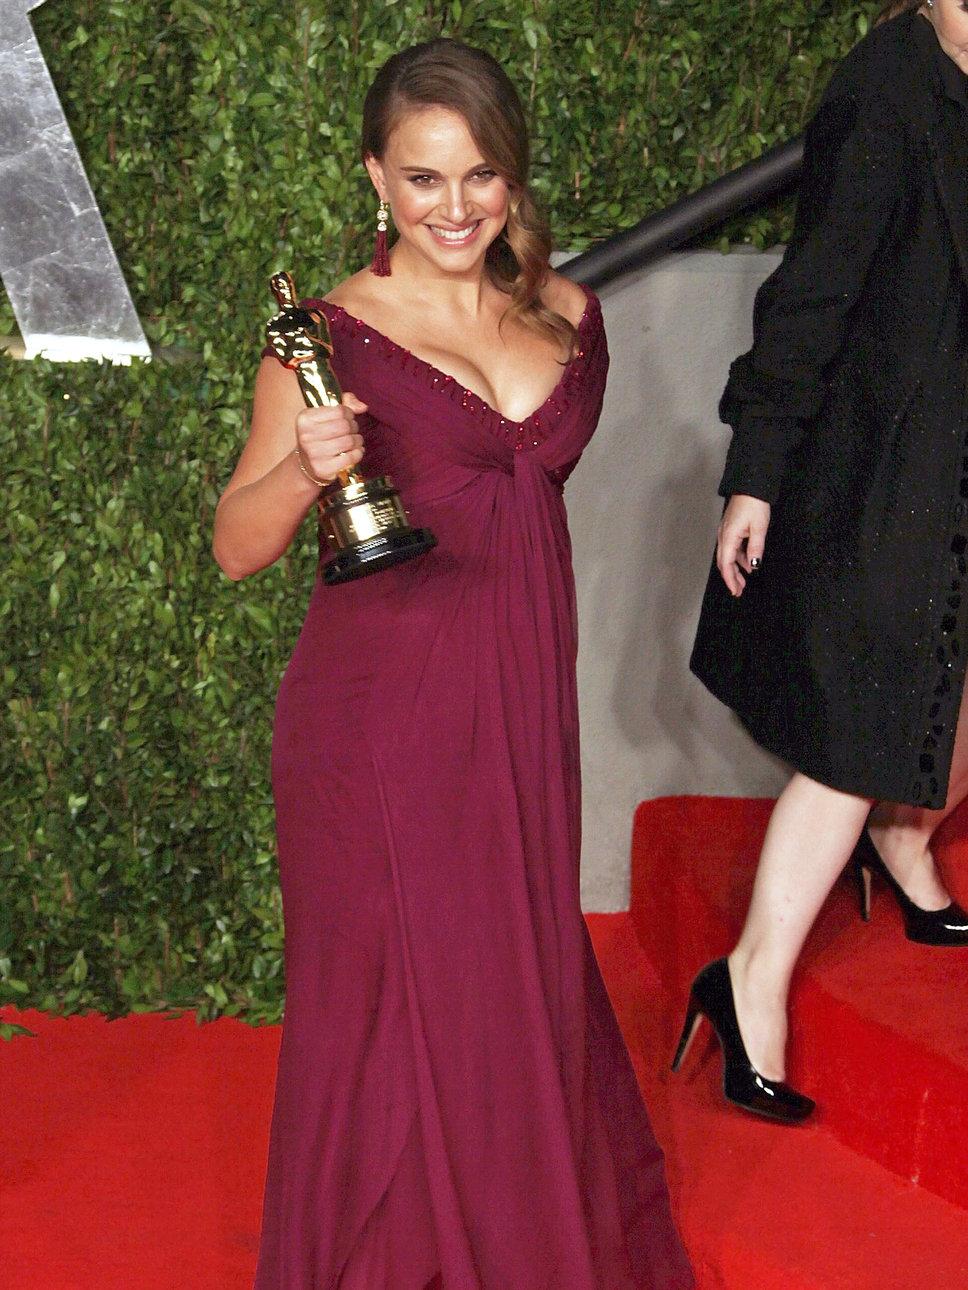 Natalie Portman Natalie Portman Red Carpet Looks